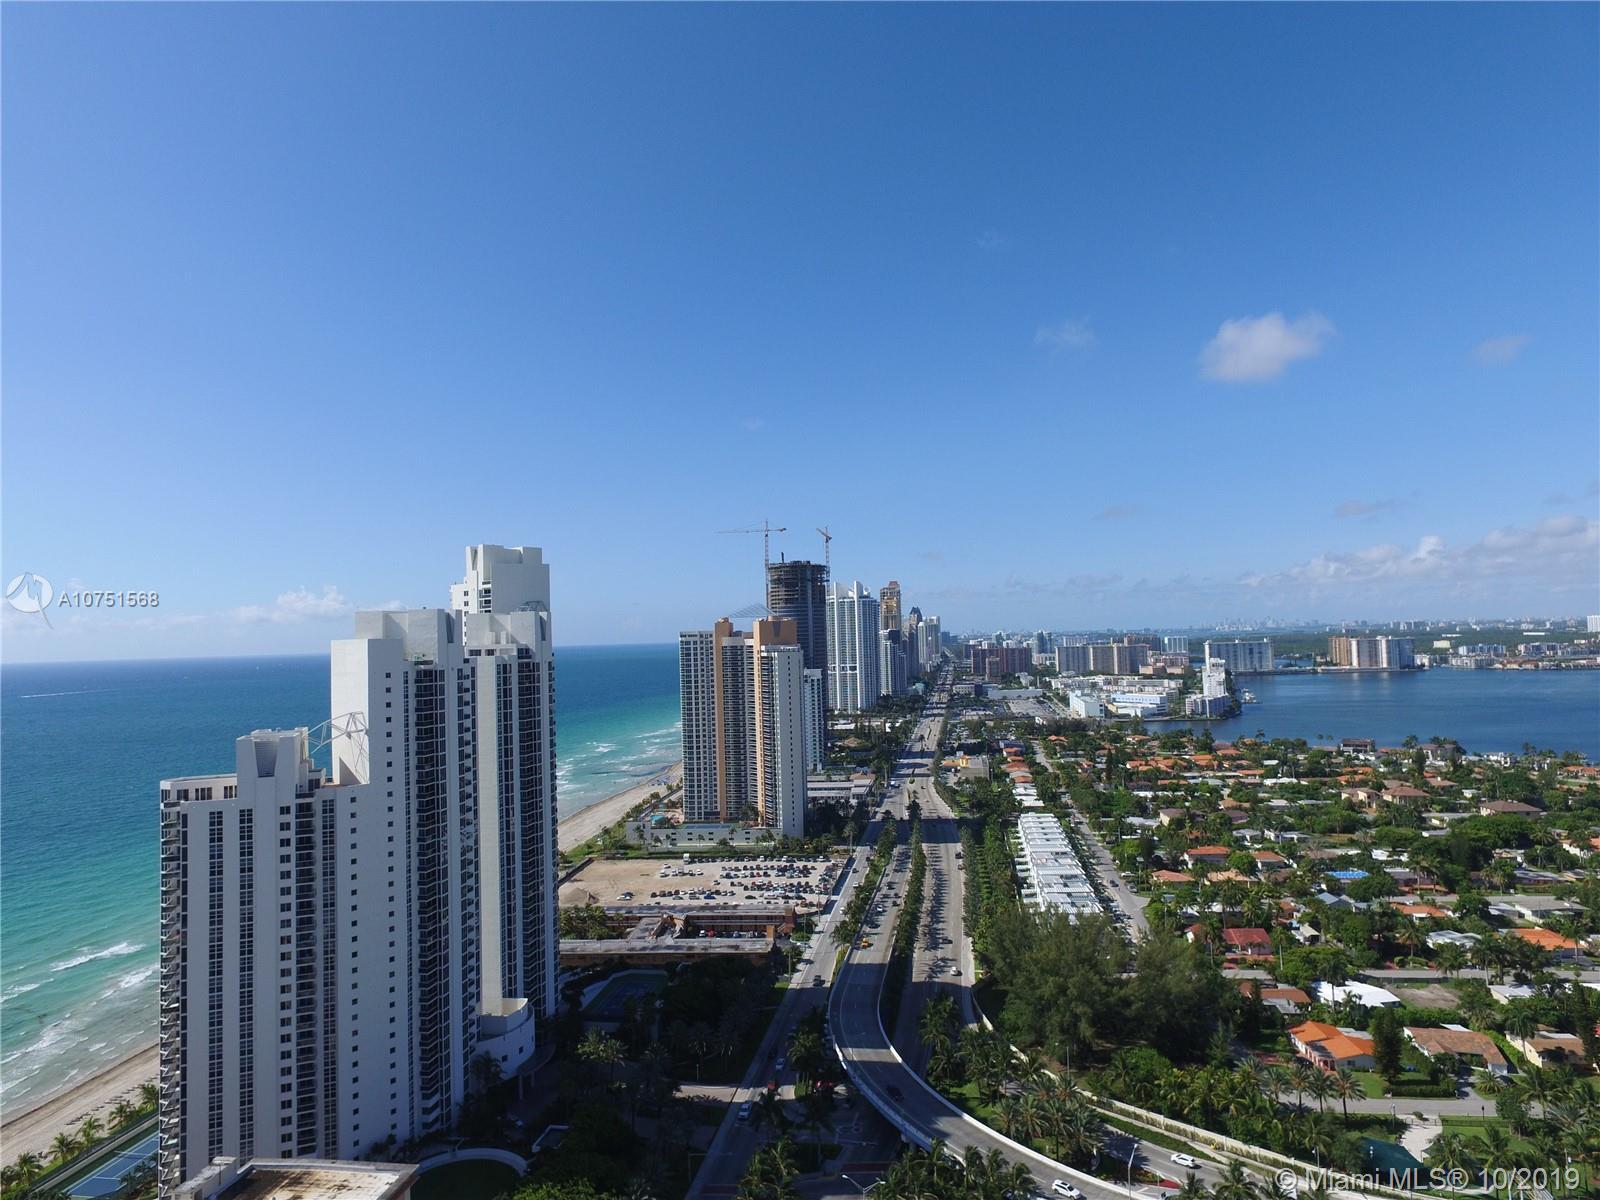 Ocean View #521 - 28 - photo